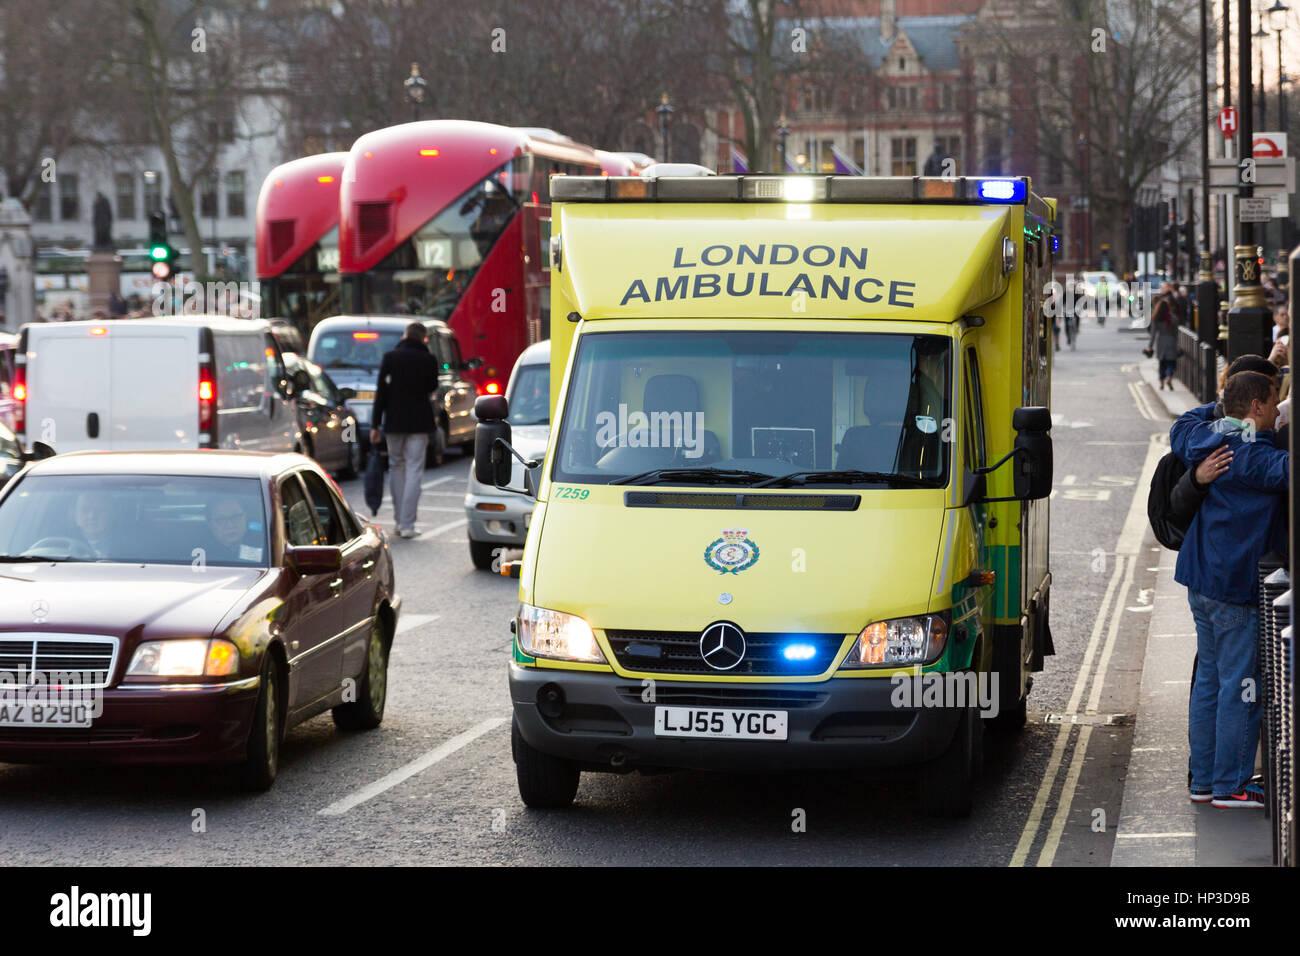 LONDON AMBULANCE MERCEDES PARKED ON BLUE LIGHTS Stock Photo